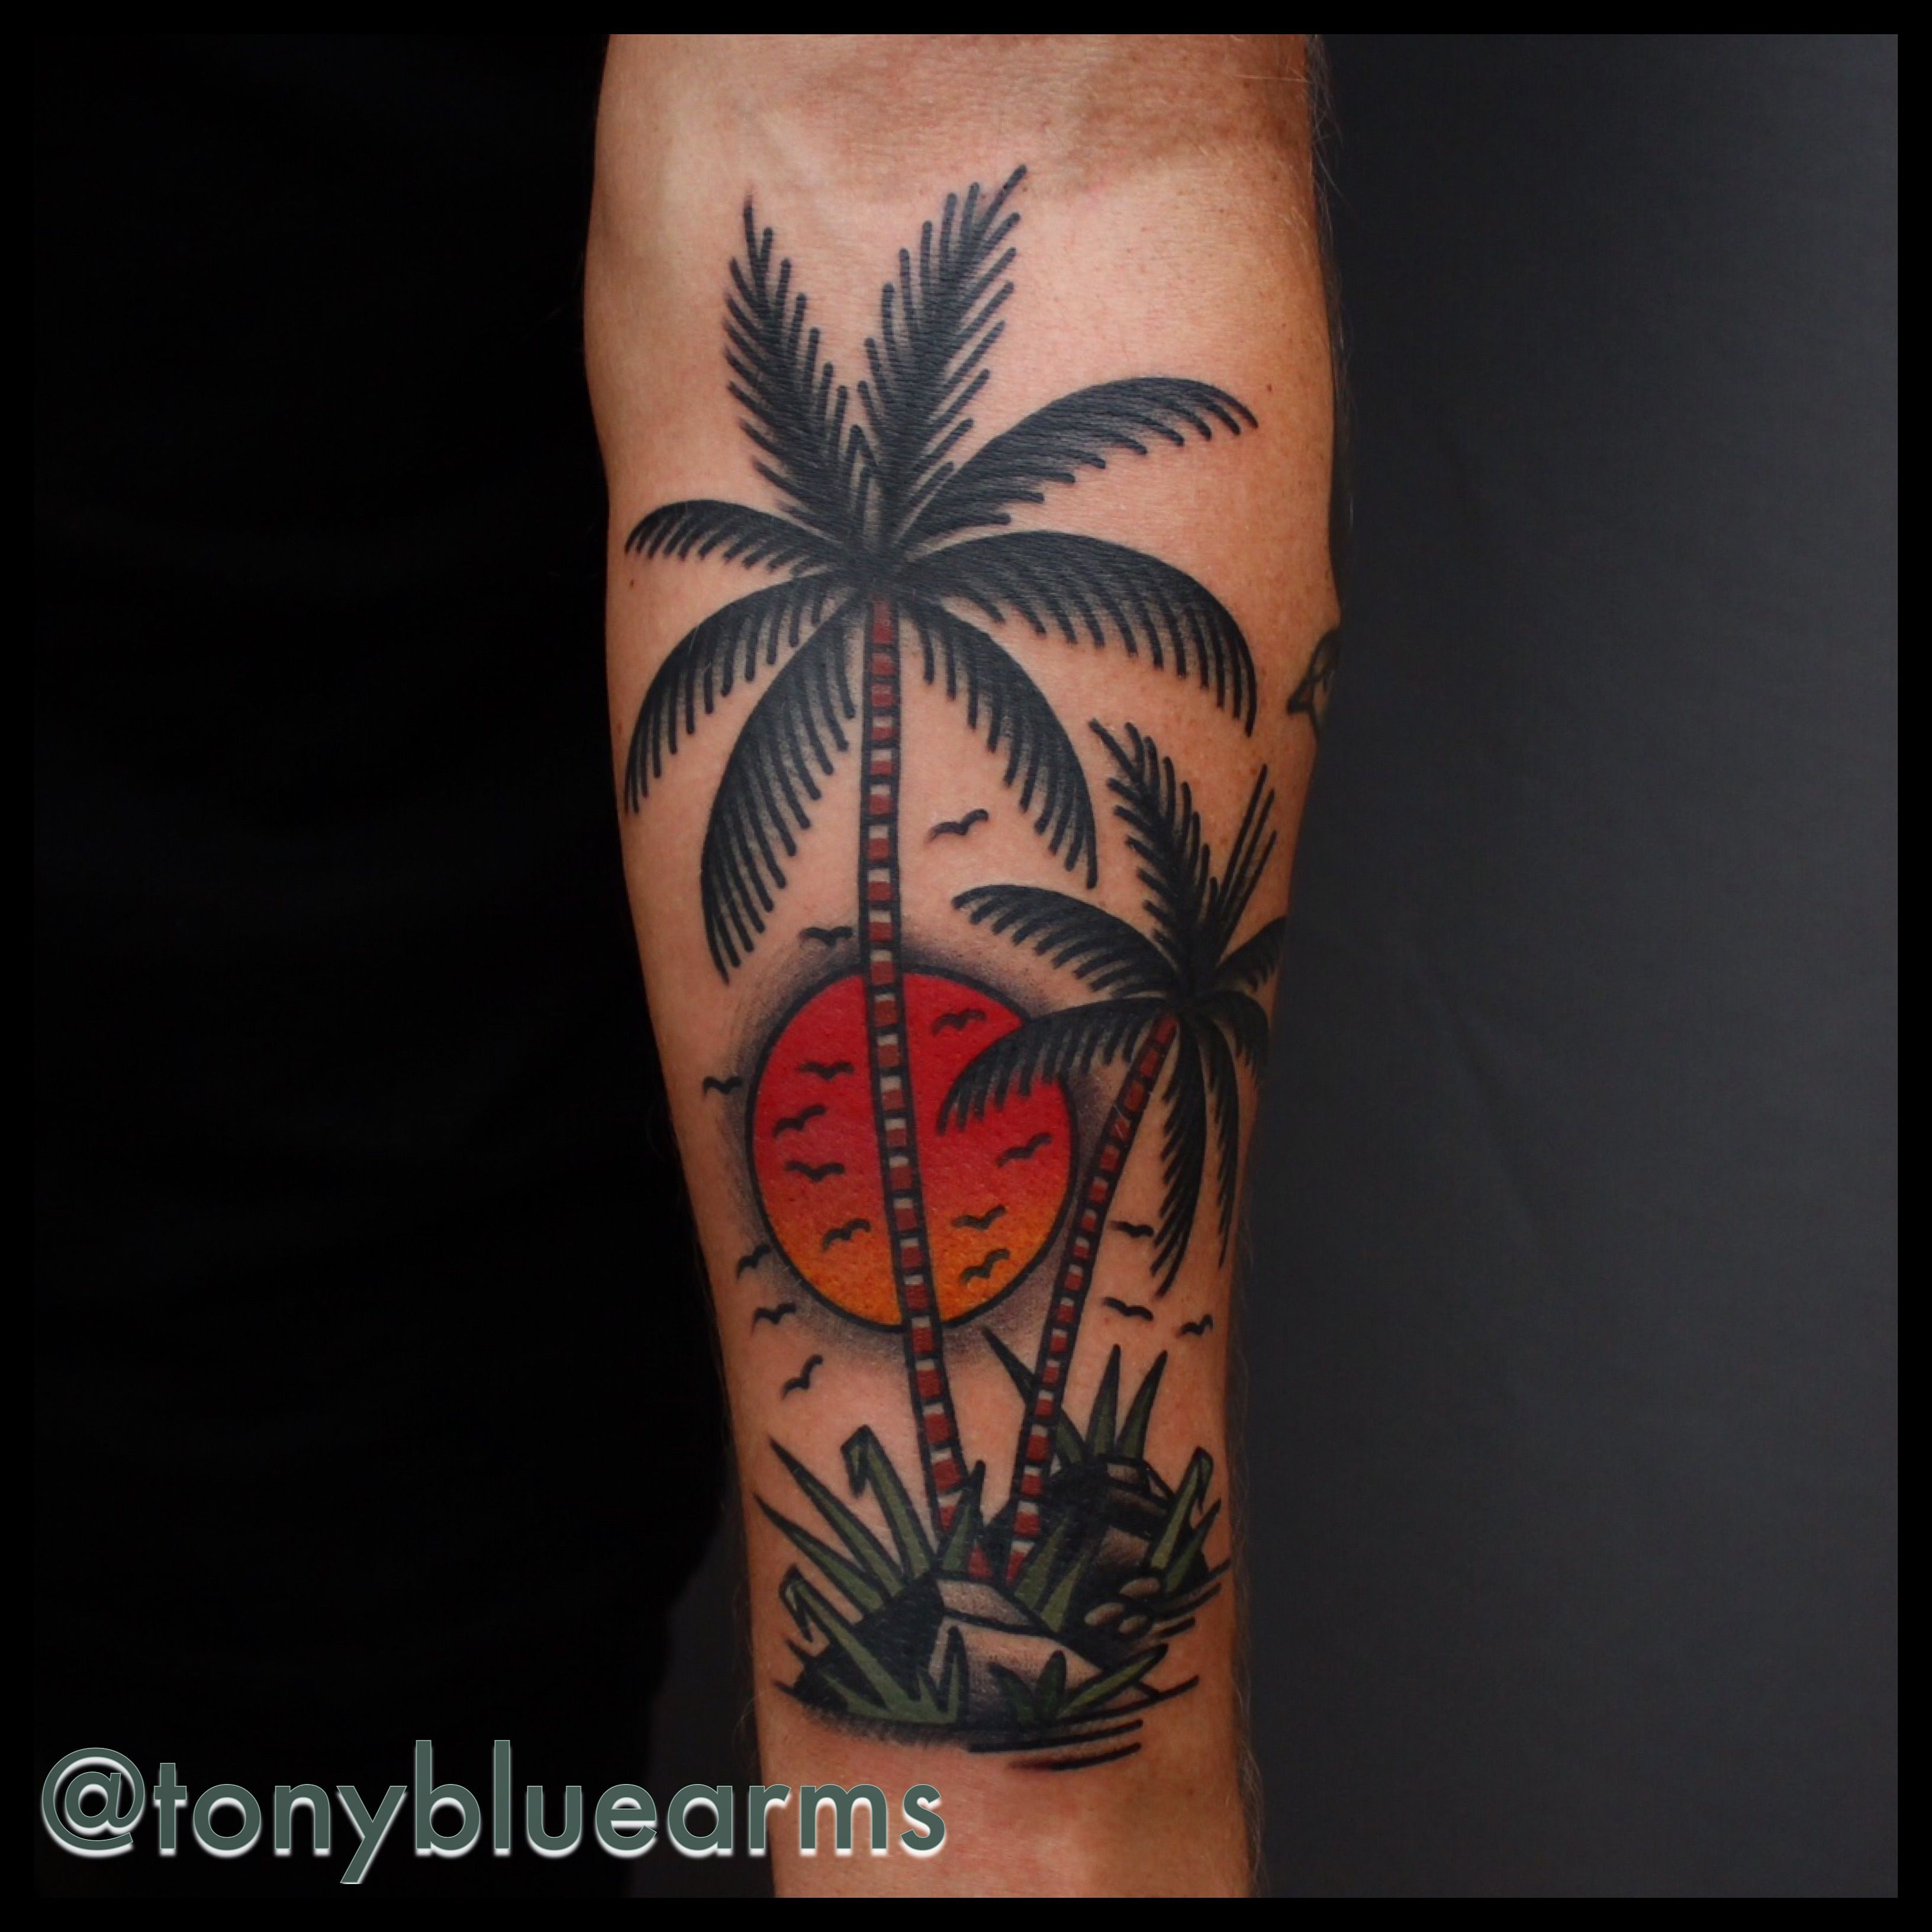 My New Tattoo Traditional Palmtree Tattoo Love It Tony Nilsson with regard to size 3264 X 3264